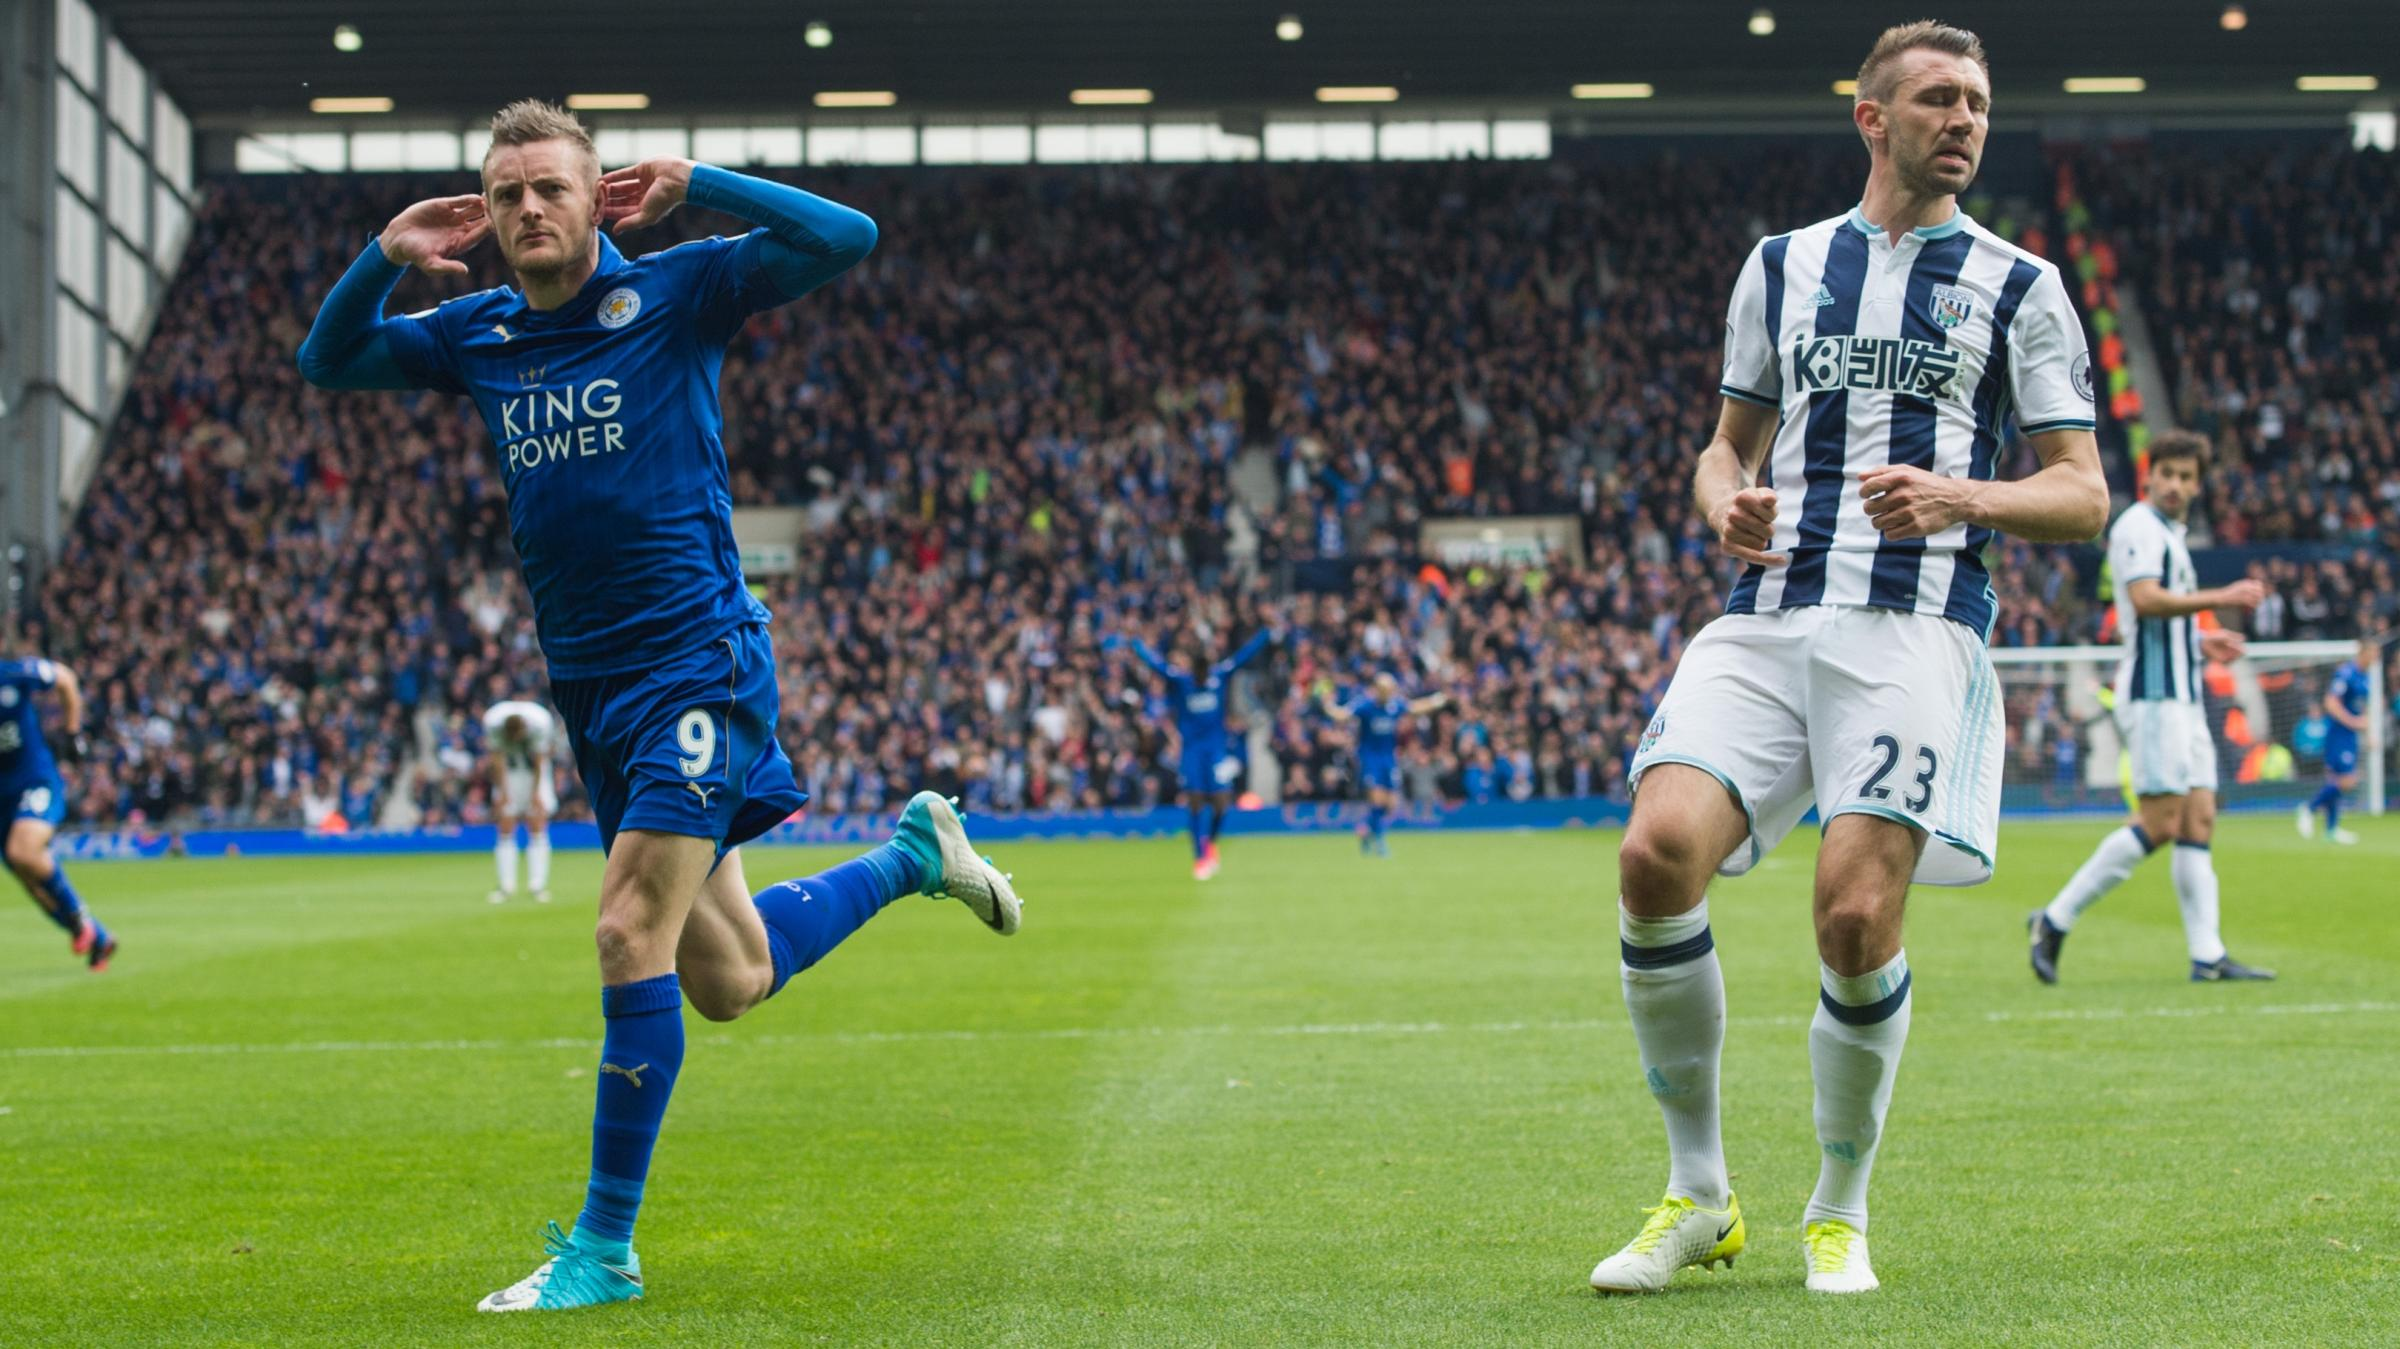 Wl wladimir klitschko wikipedia - Jamie Vardy Strikes To Ease Leicester S Relegation Fears Hillingdon Times